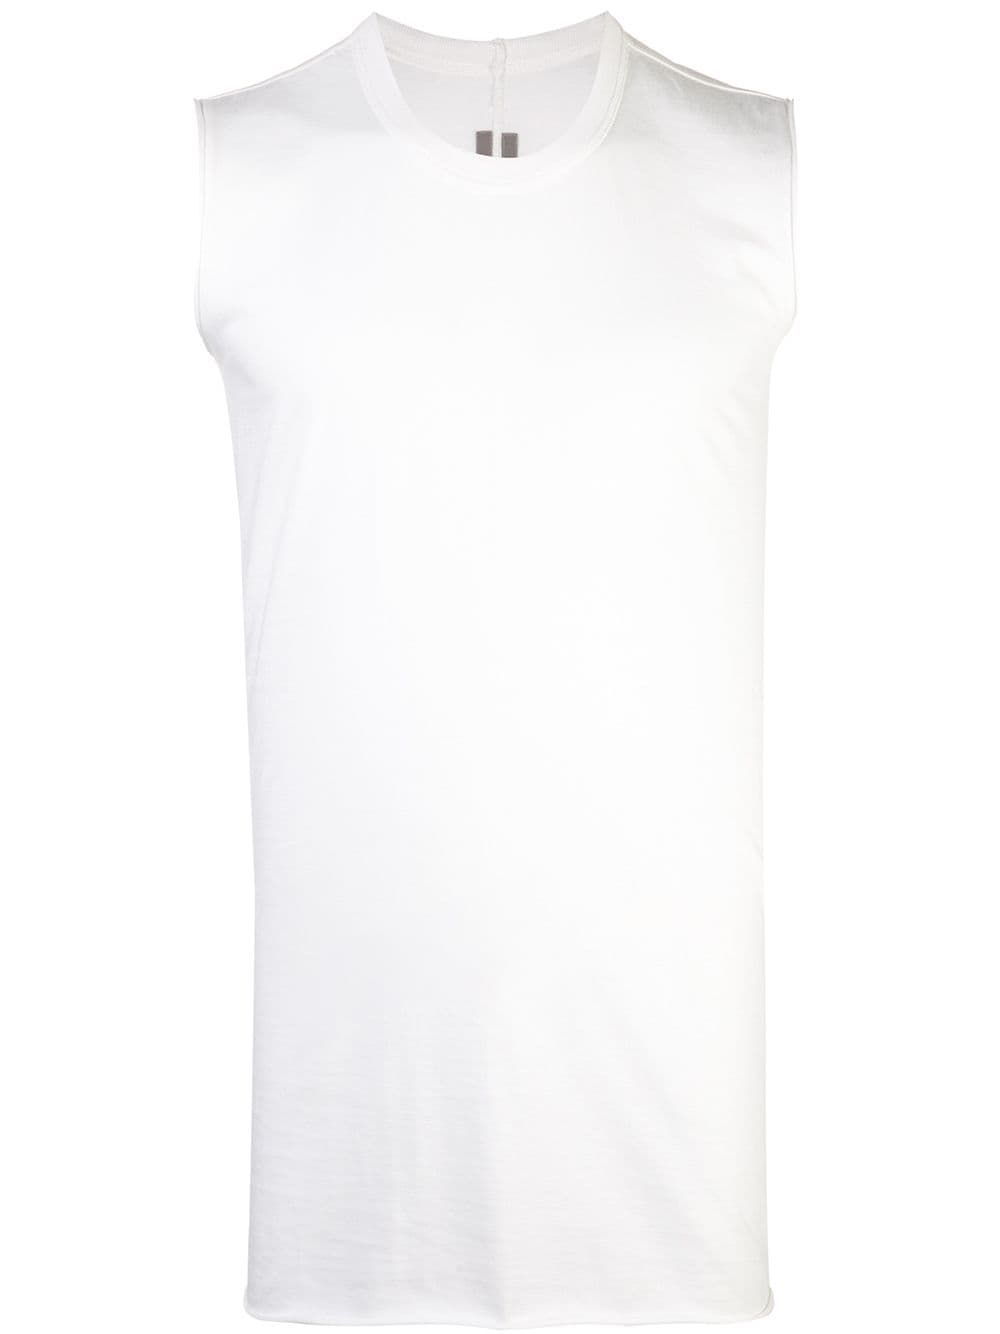 b924567286e23 RICK OWENS RICK OWENS FITTED TANK TOP - WHITE.  rickowens  cloth ...